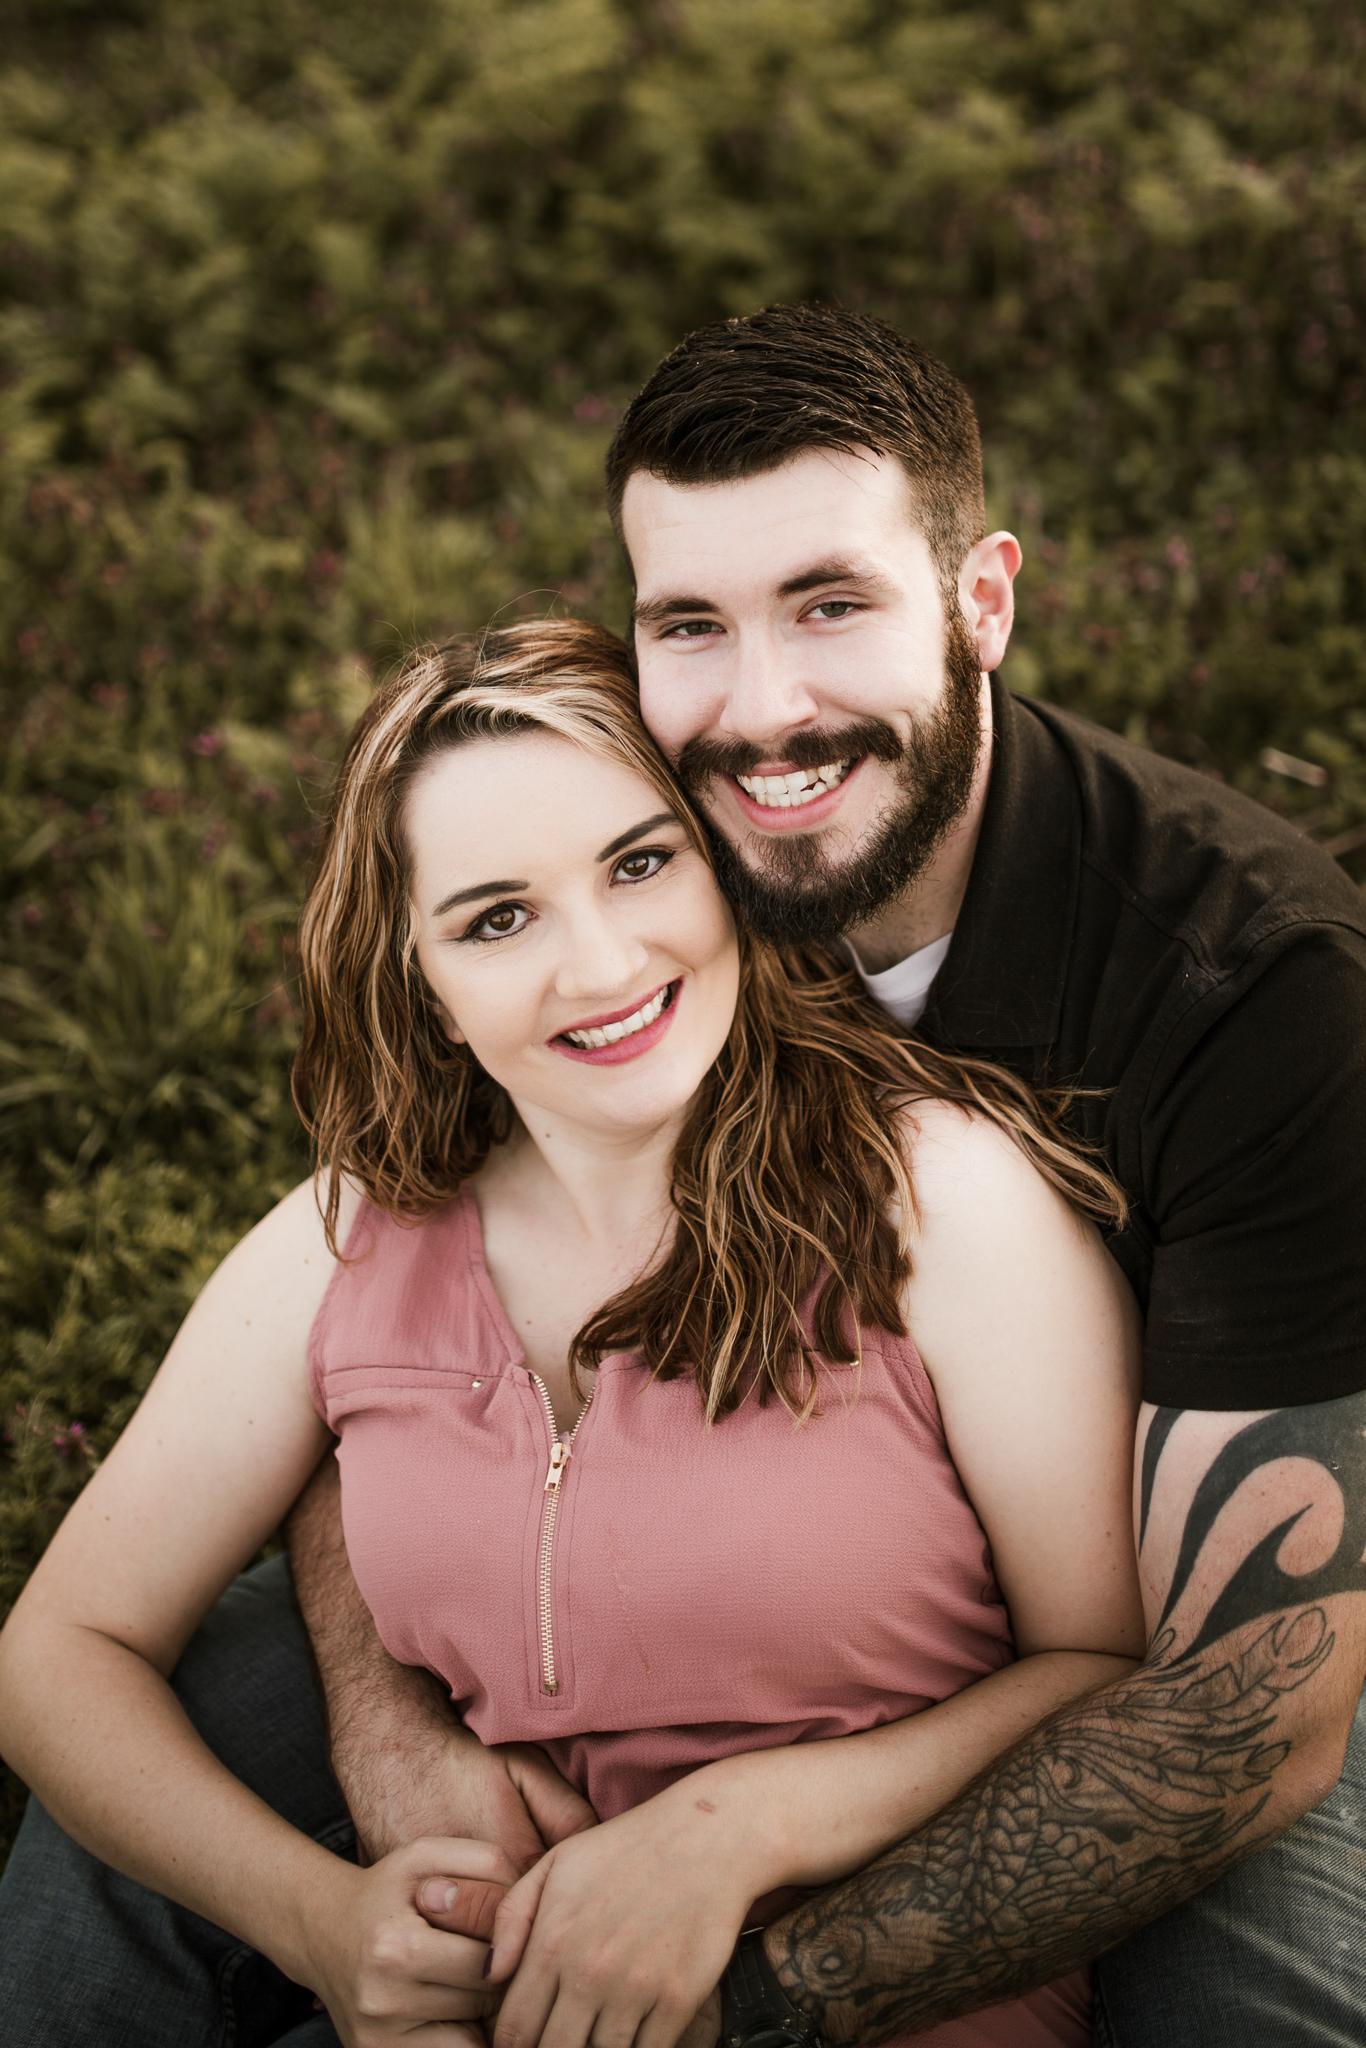 Richmond Kentucky Engagement Photographer - Ariana Jordan Photography -43.jpg